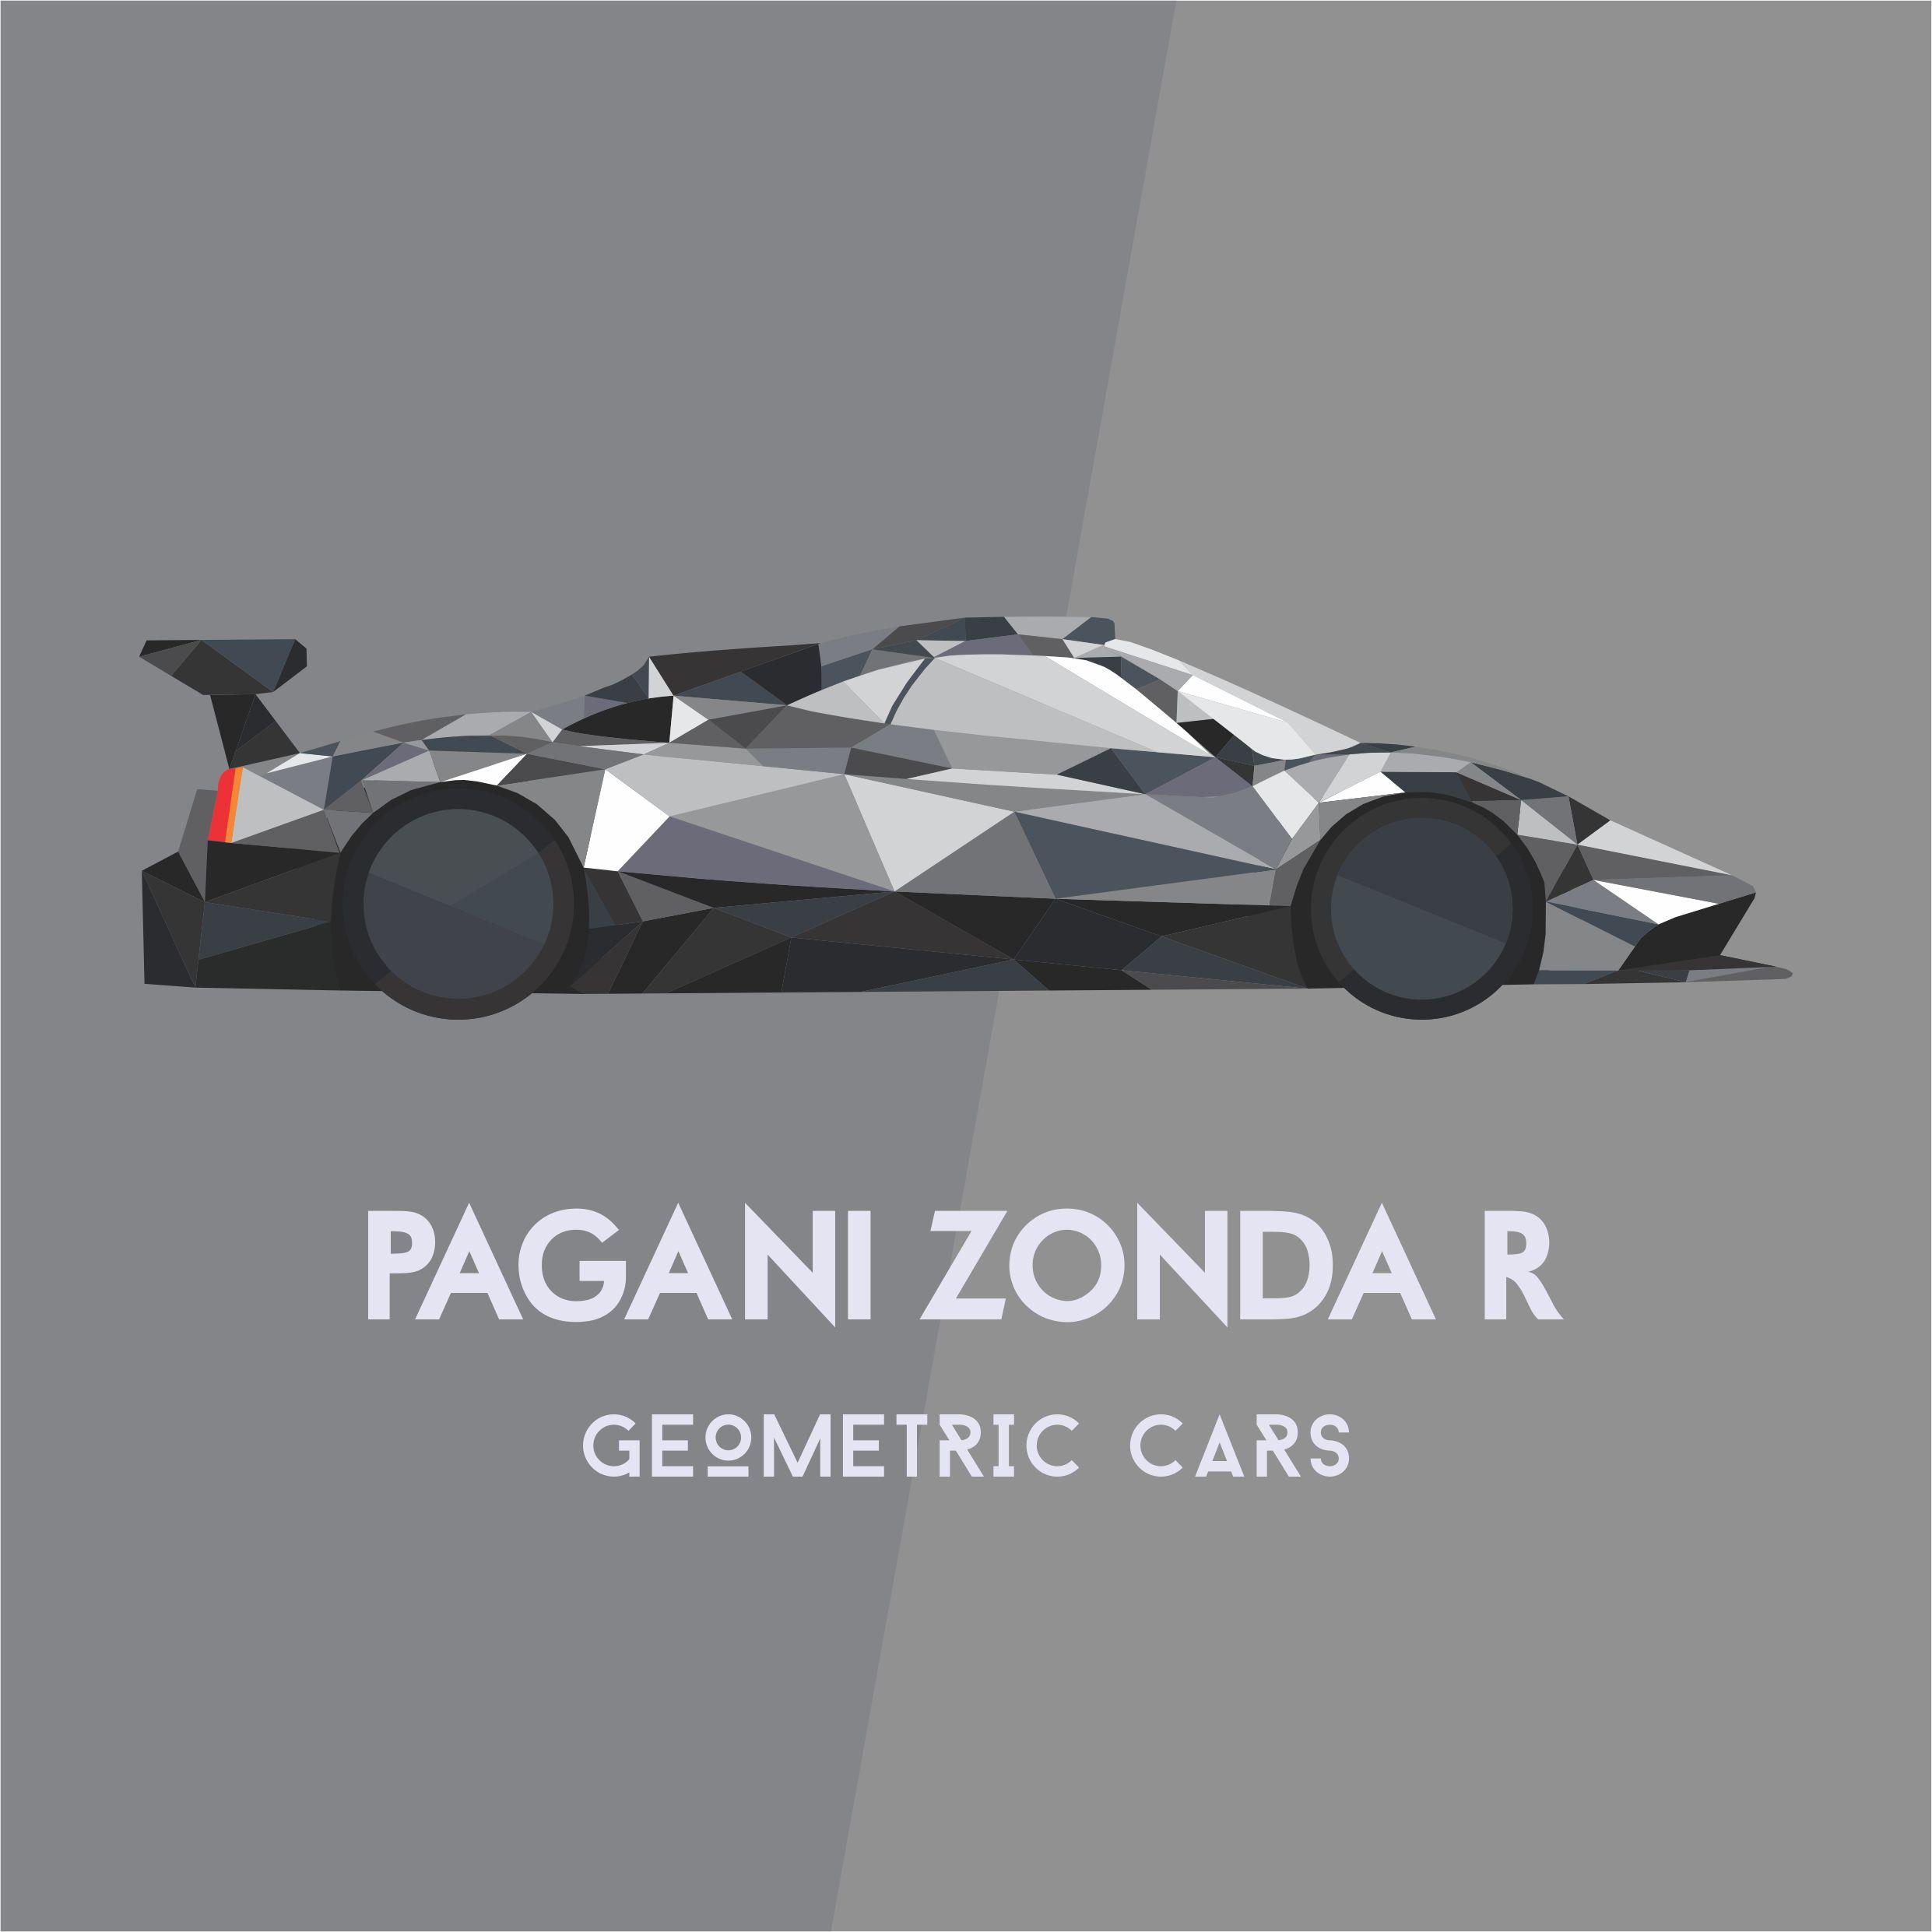 Pagani Zonda R Geometric Car Collection